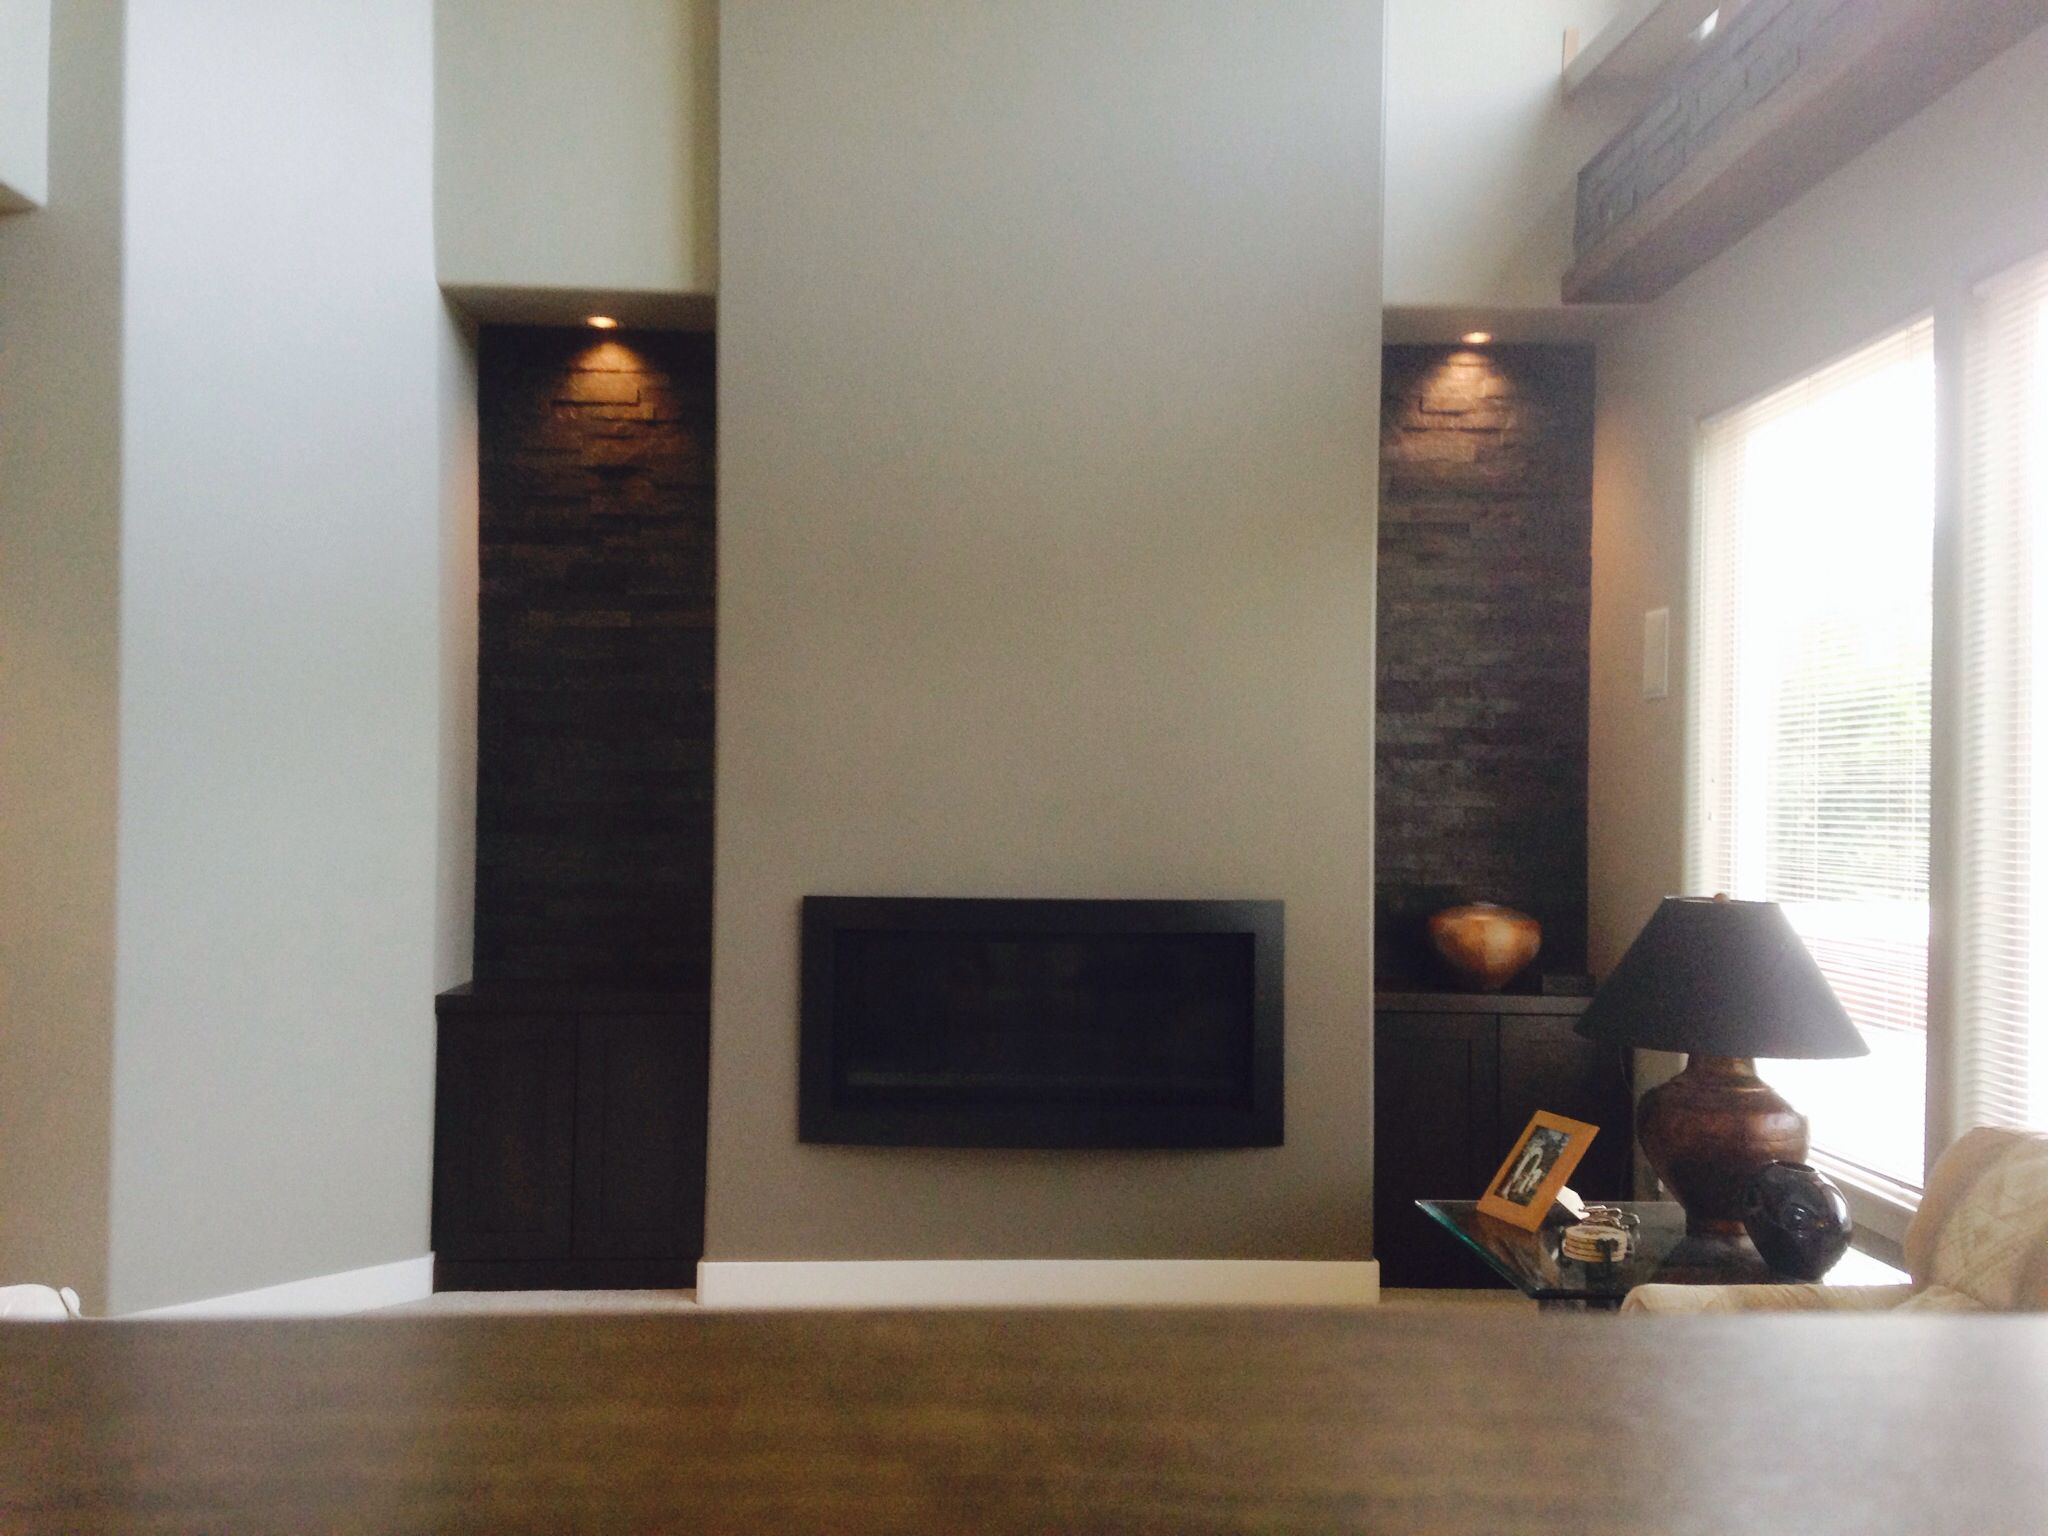 Tall Fireplace Beautiful Modern Fireplace Linear Fireplace Black Rock Tall